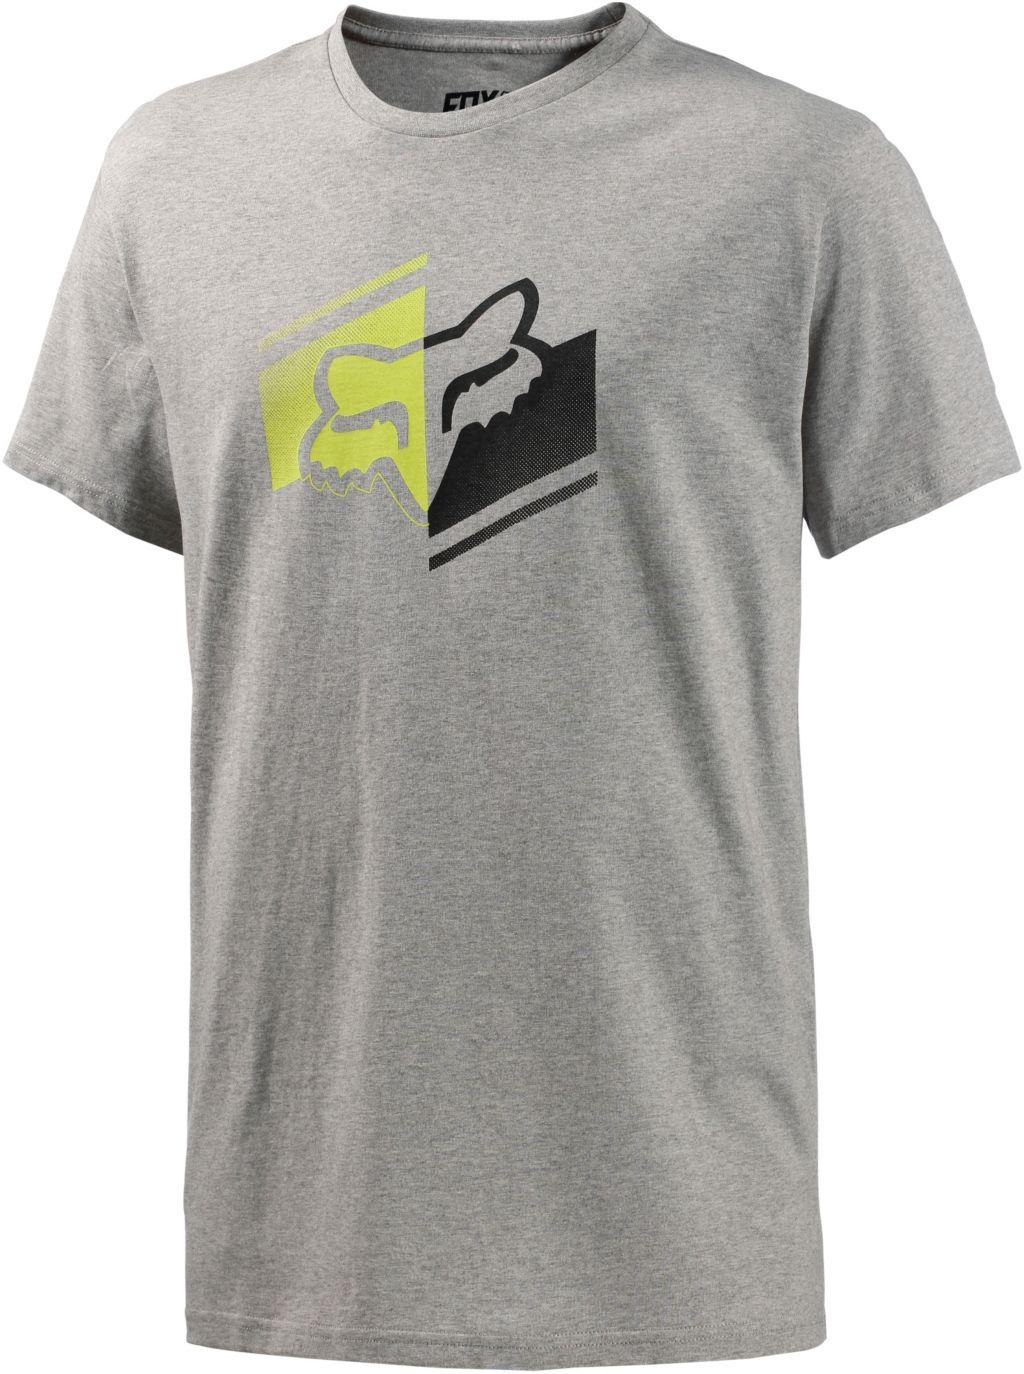 Boot Sector Printshirt Herren in grau, Größe S